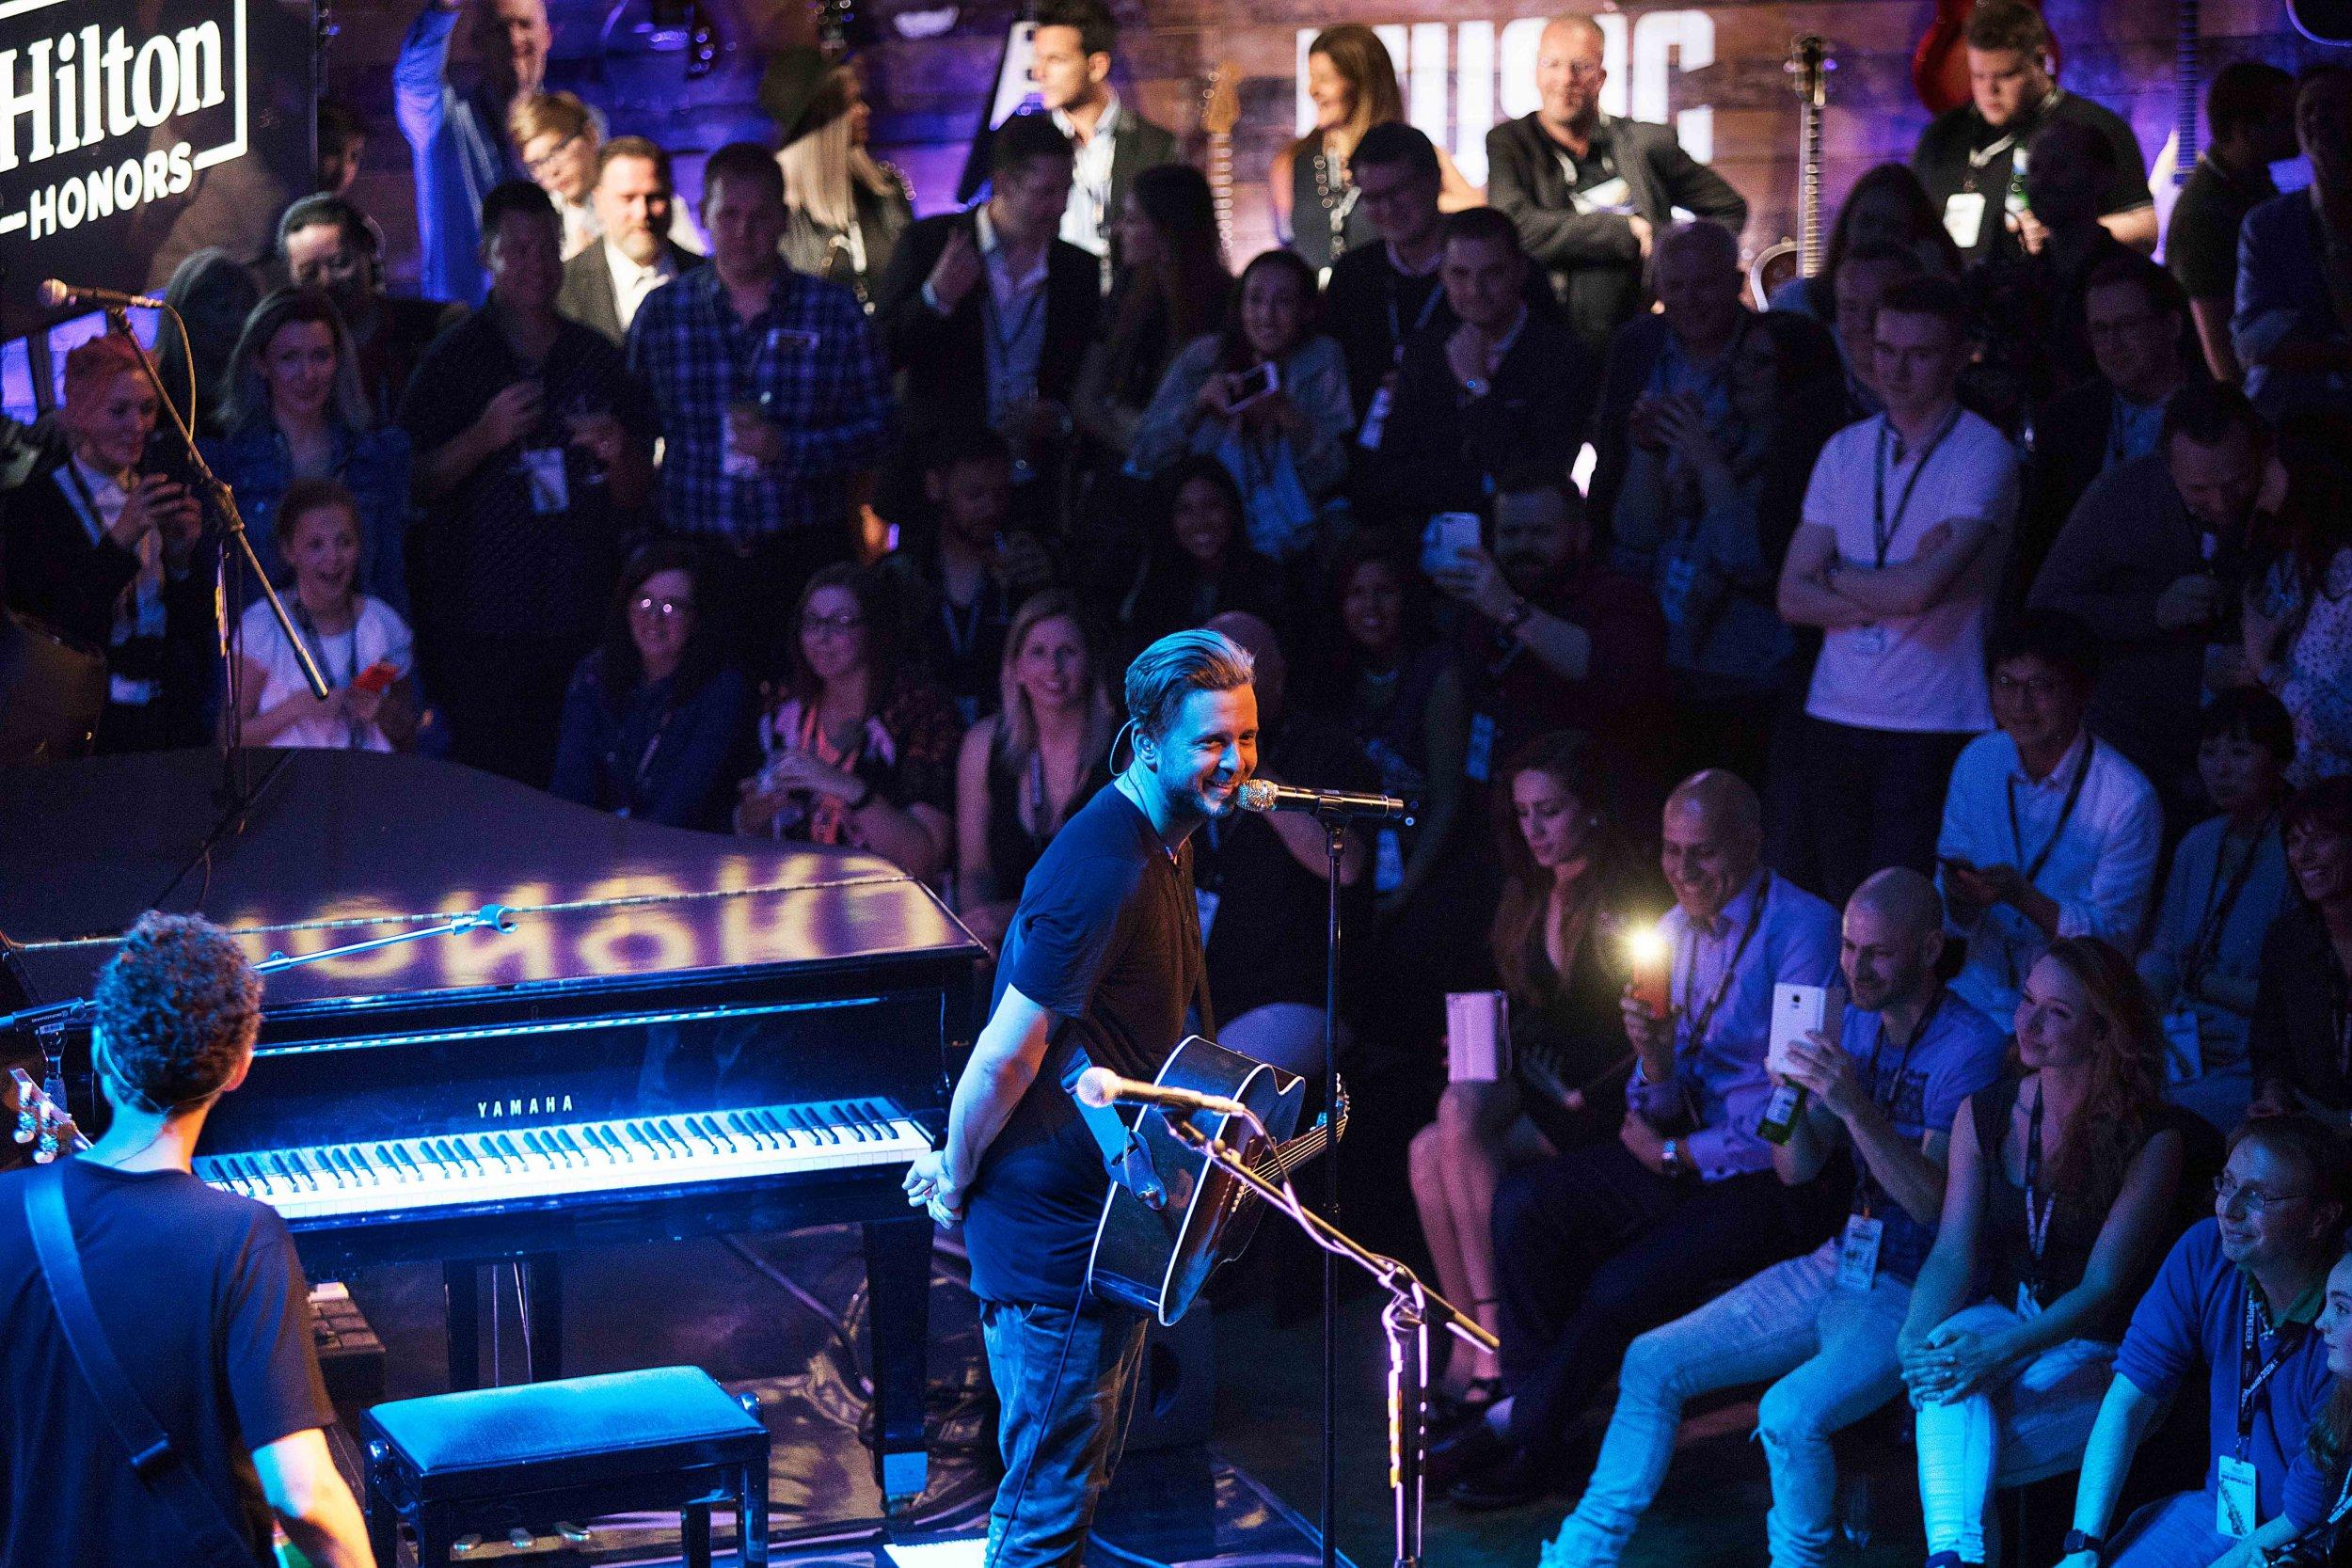 OneRepublic perform at Hilton Honors event